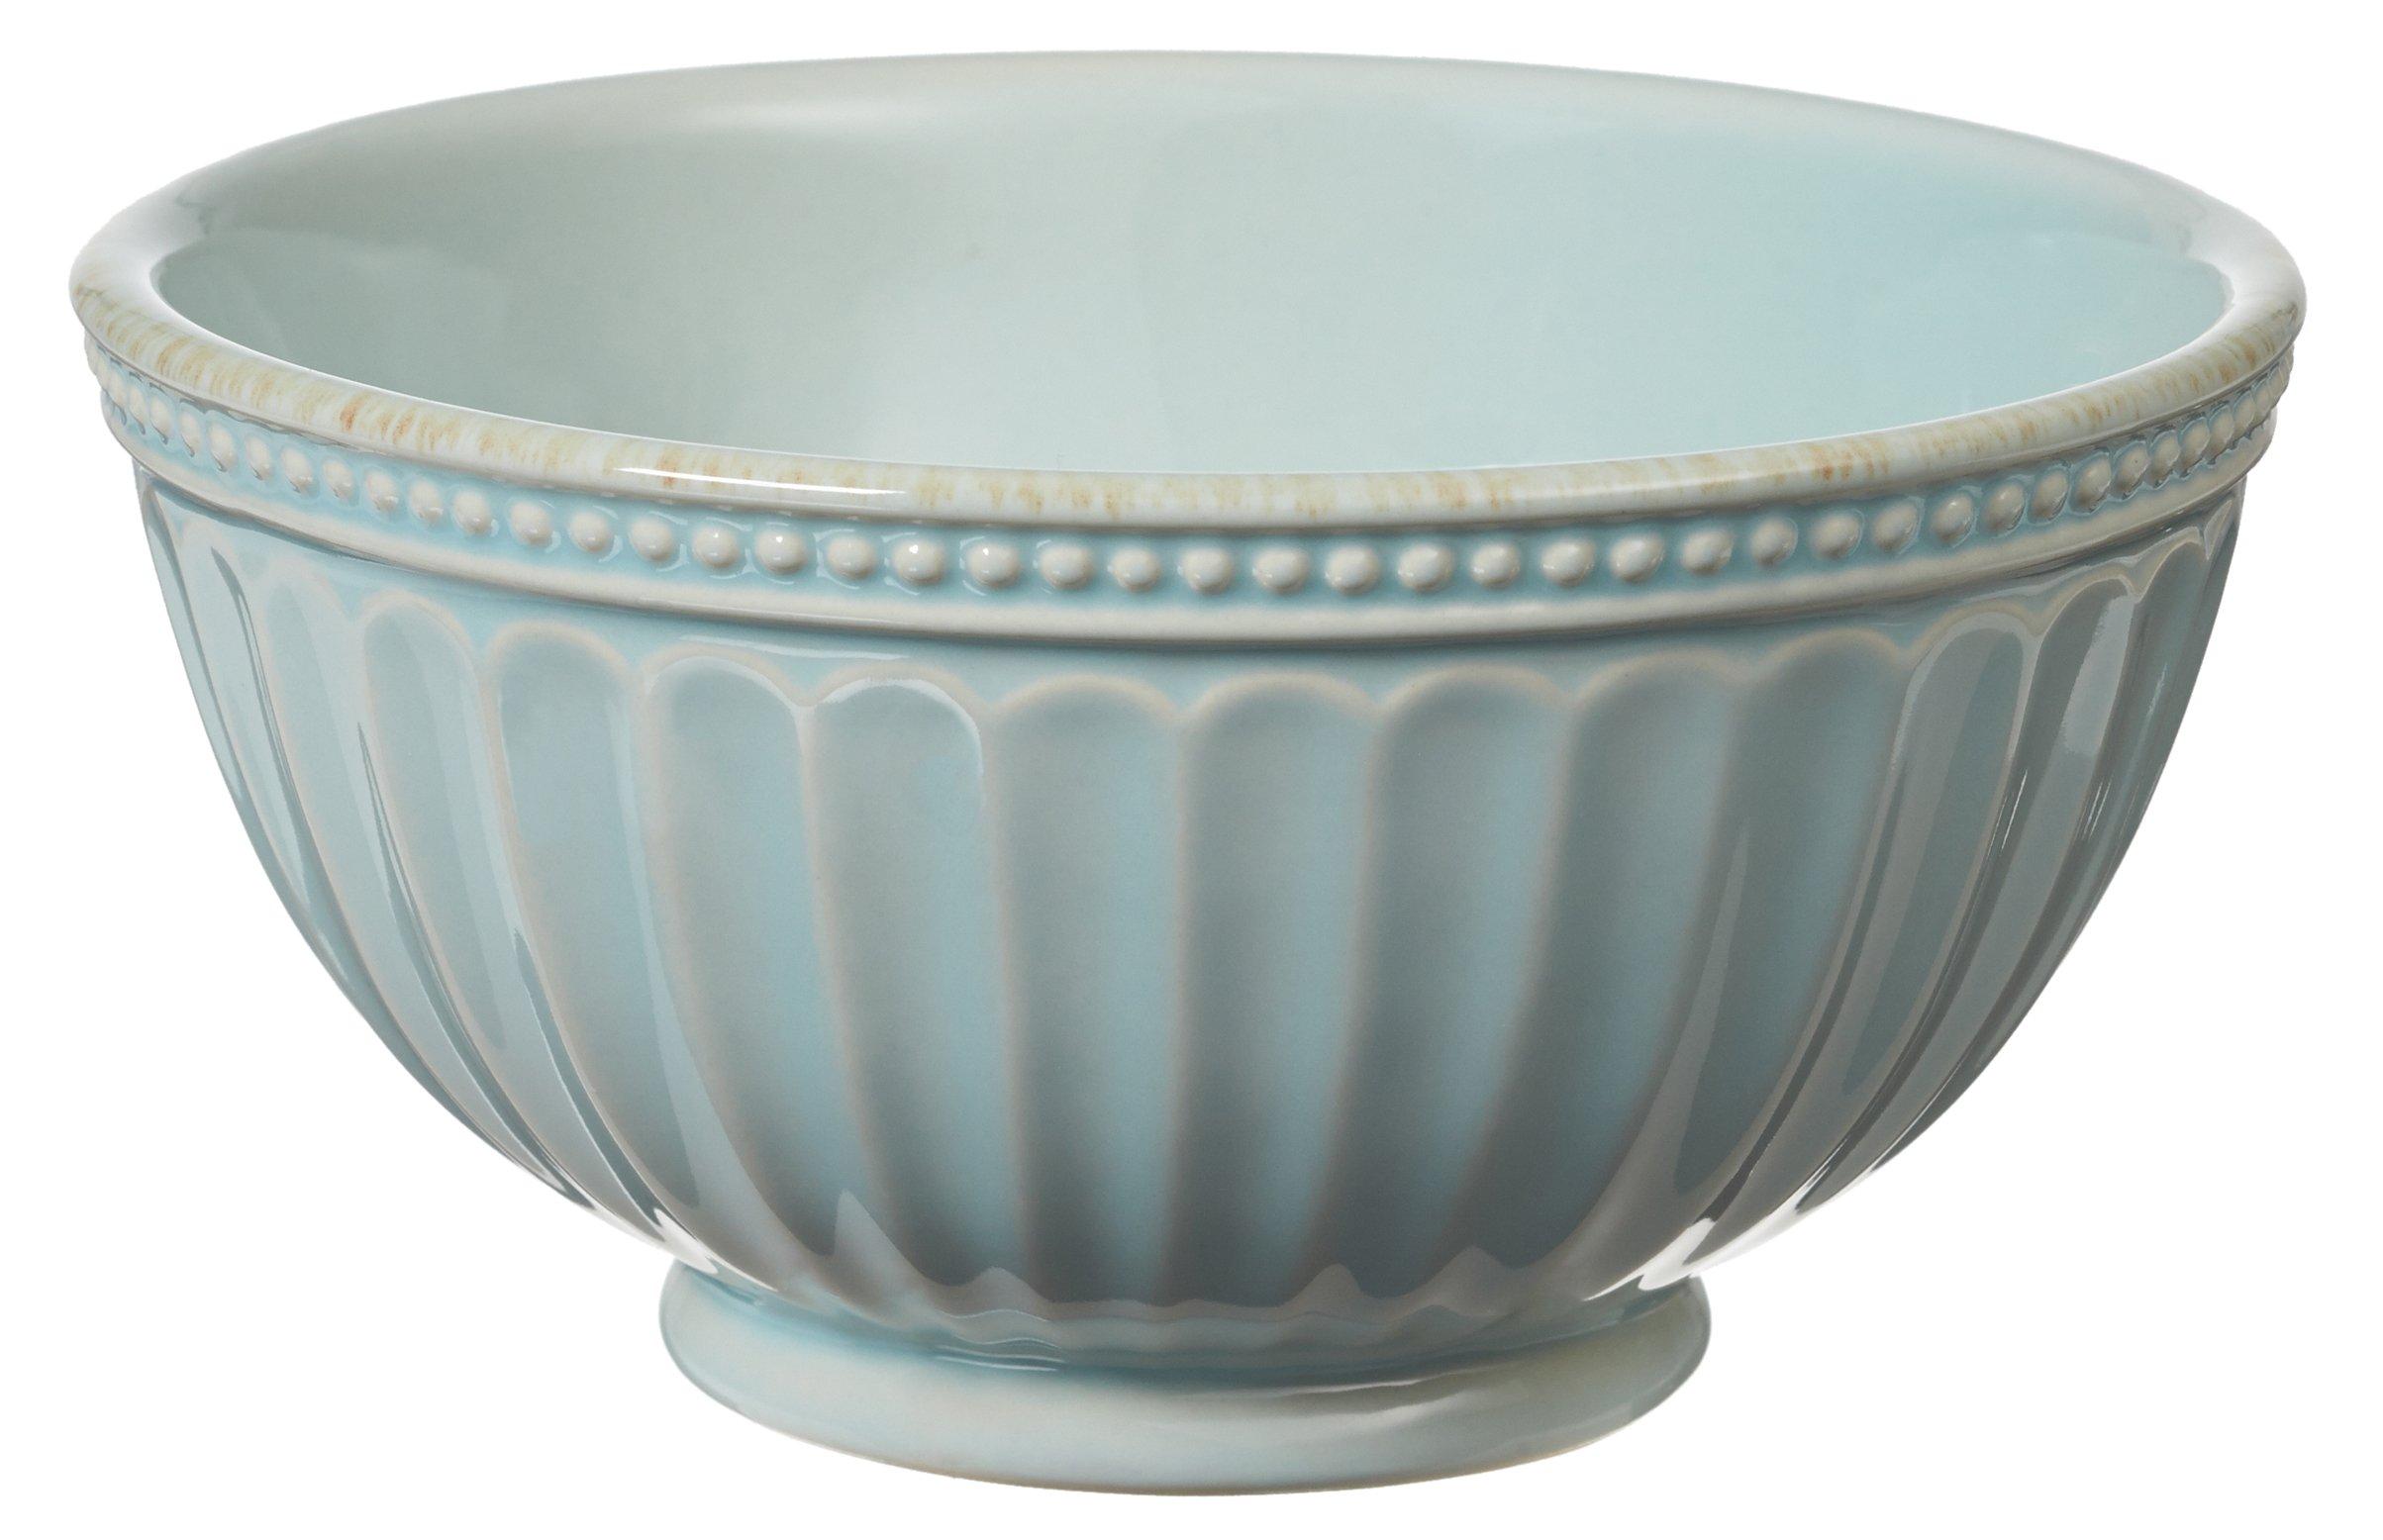 Lenox French Perle Everything Bowl, Ice Blue